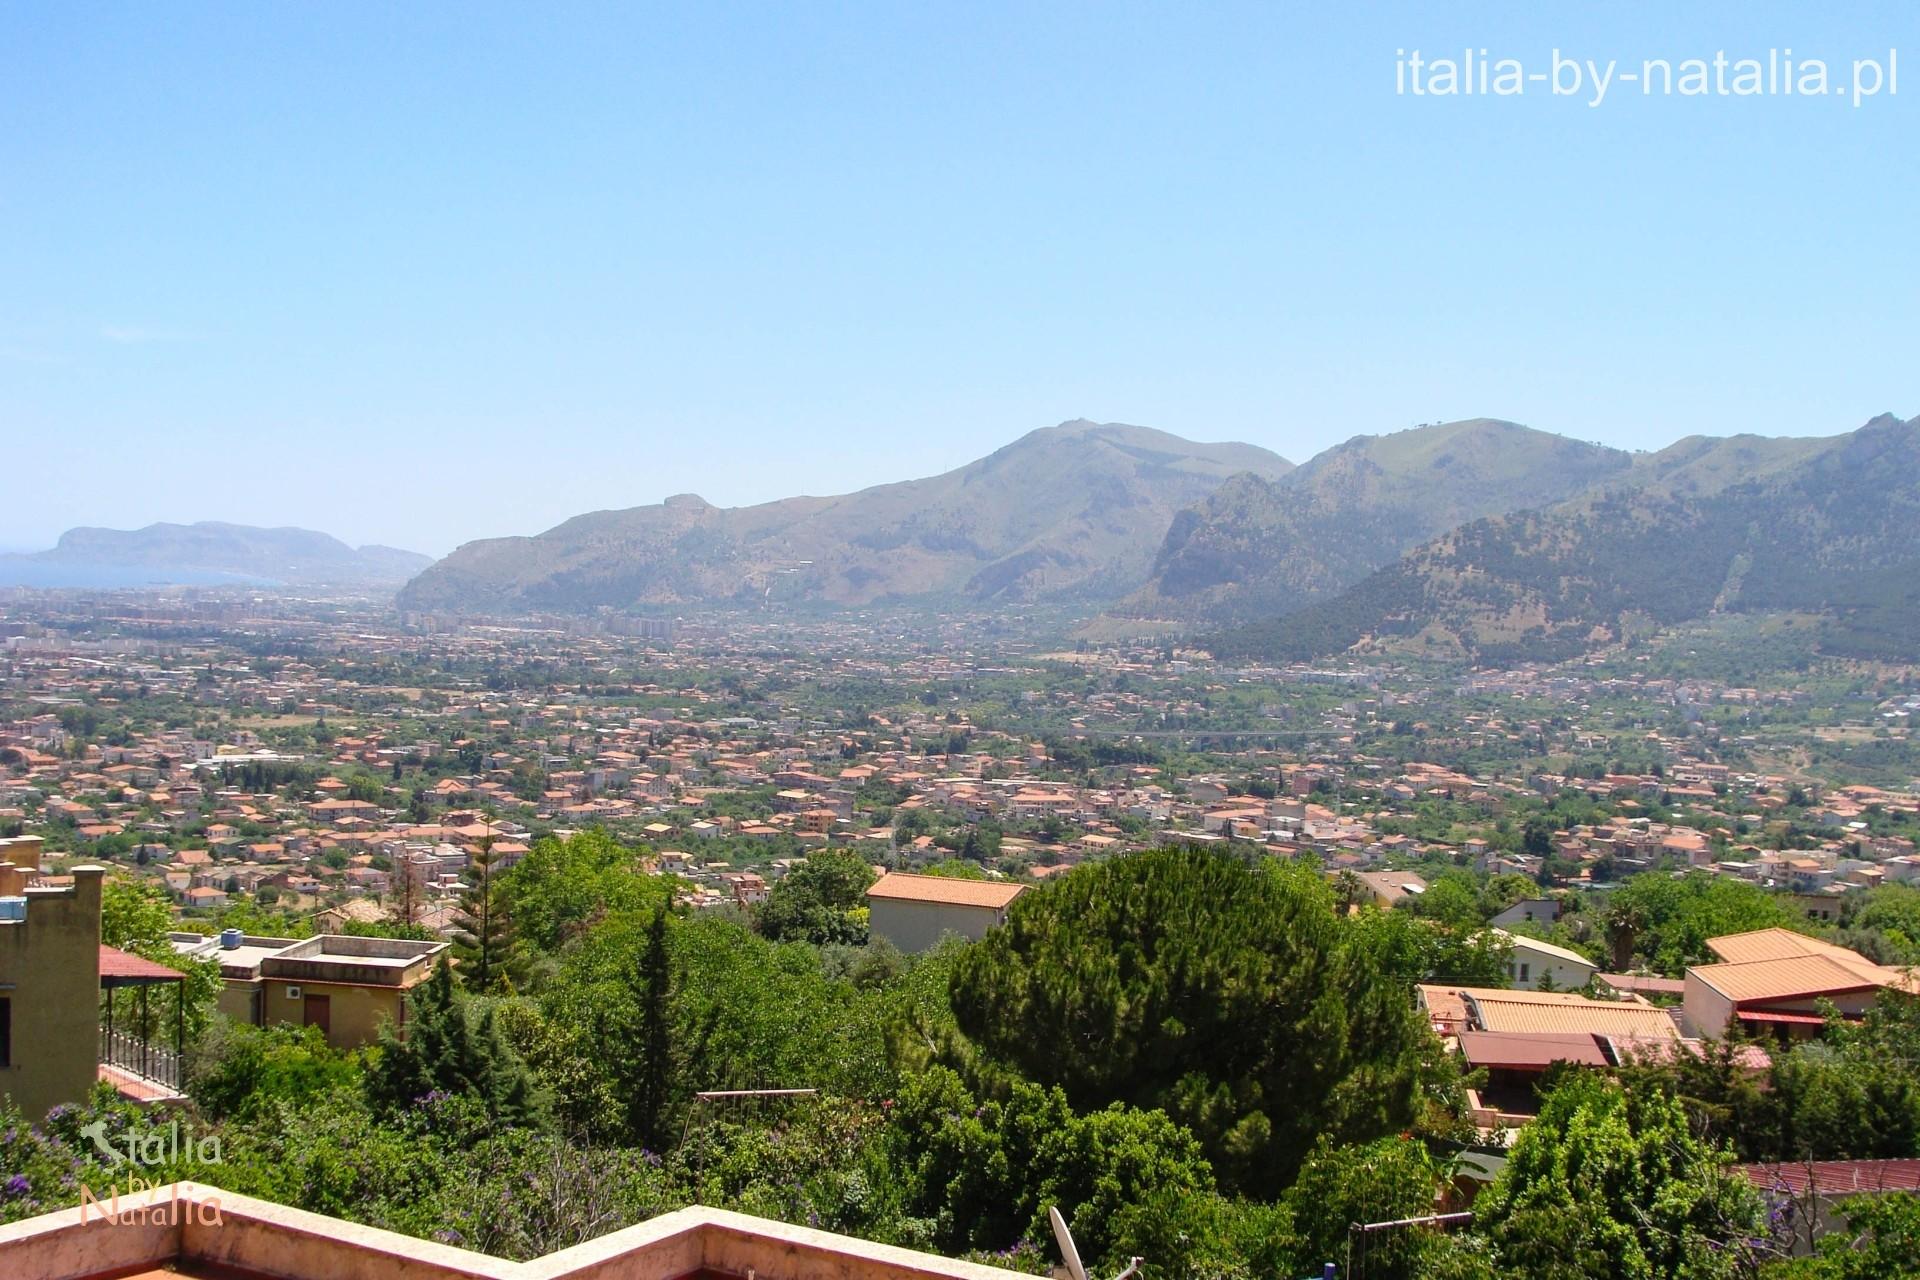 Palermo widziane z Monreale Conca d'Oro